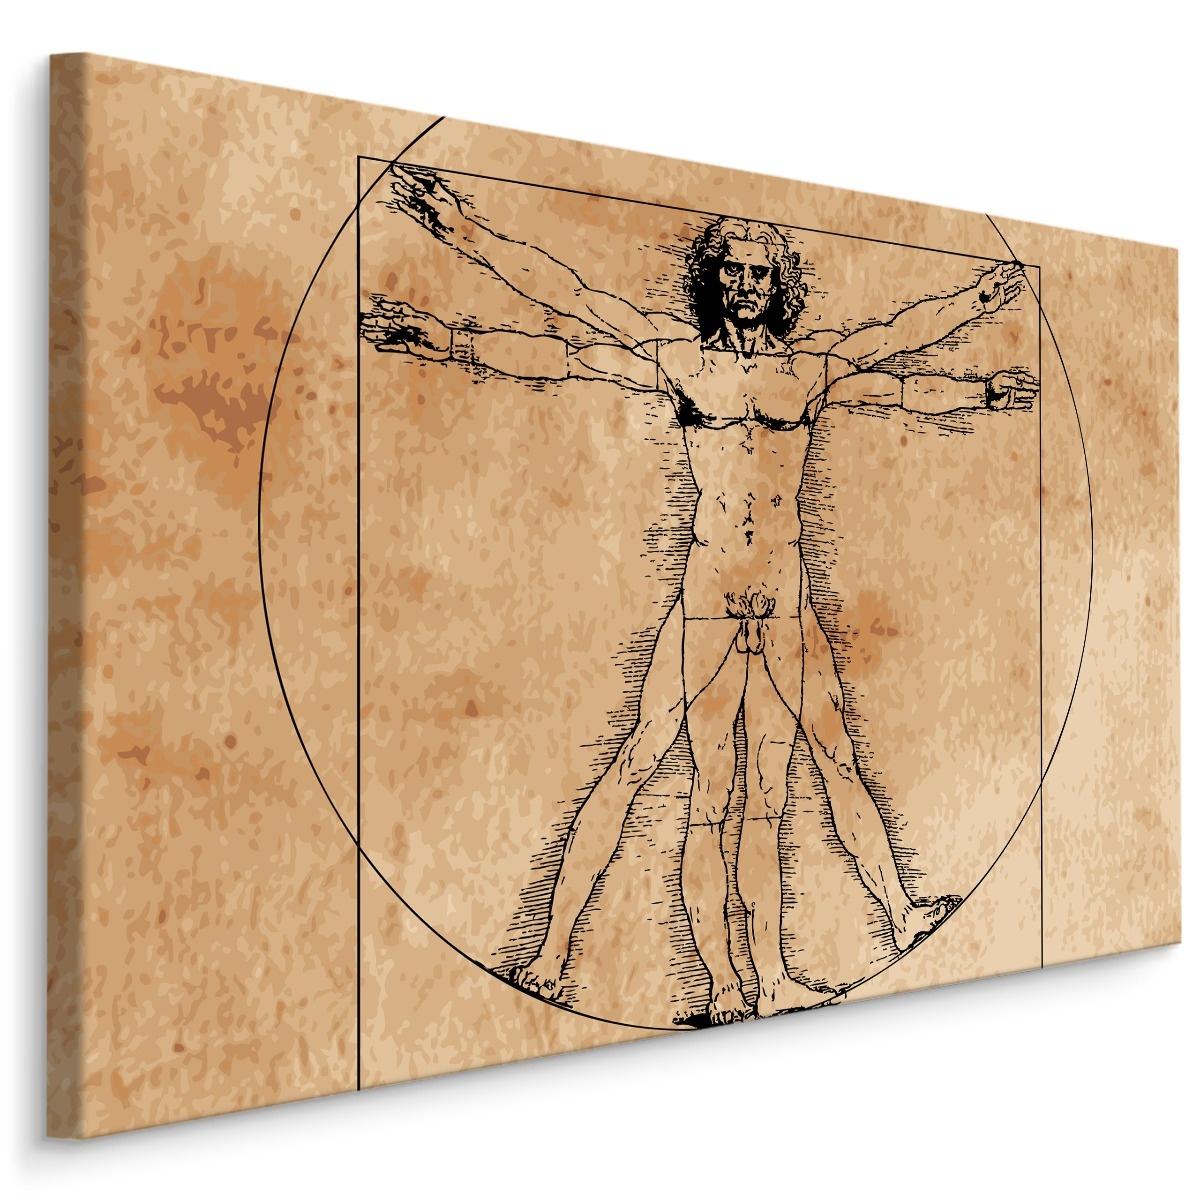 Schilderij - Vitruviusman, Leonardo da Vinci (print op canvas), beige, 4 maten, wanddecoratie